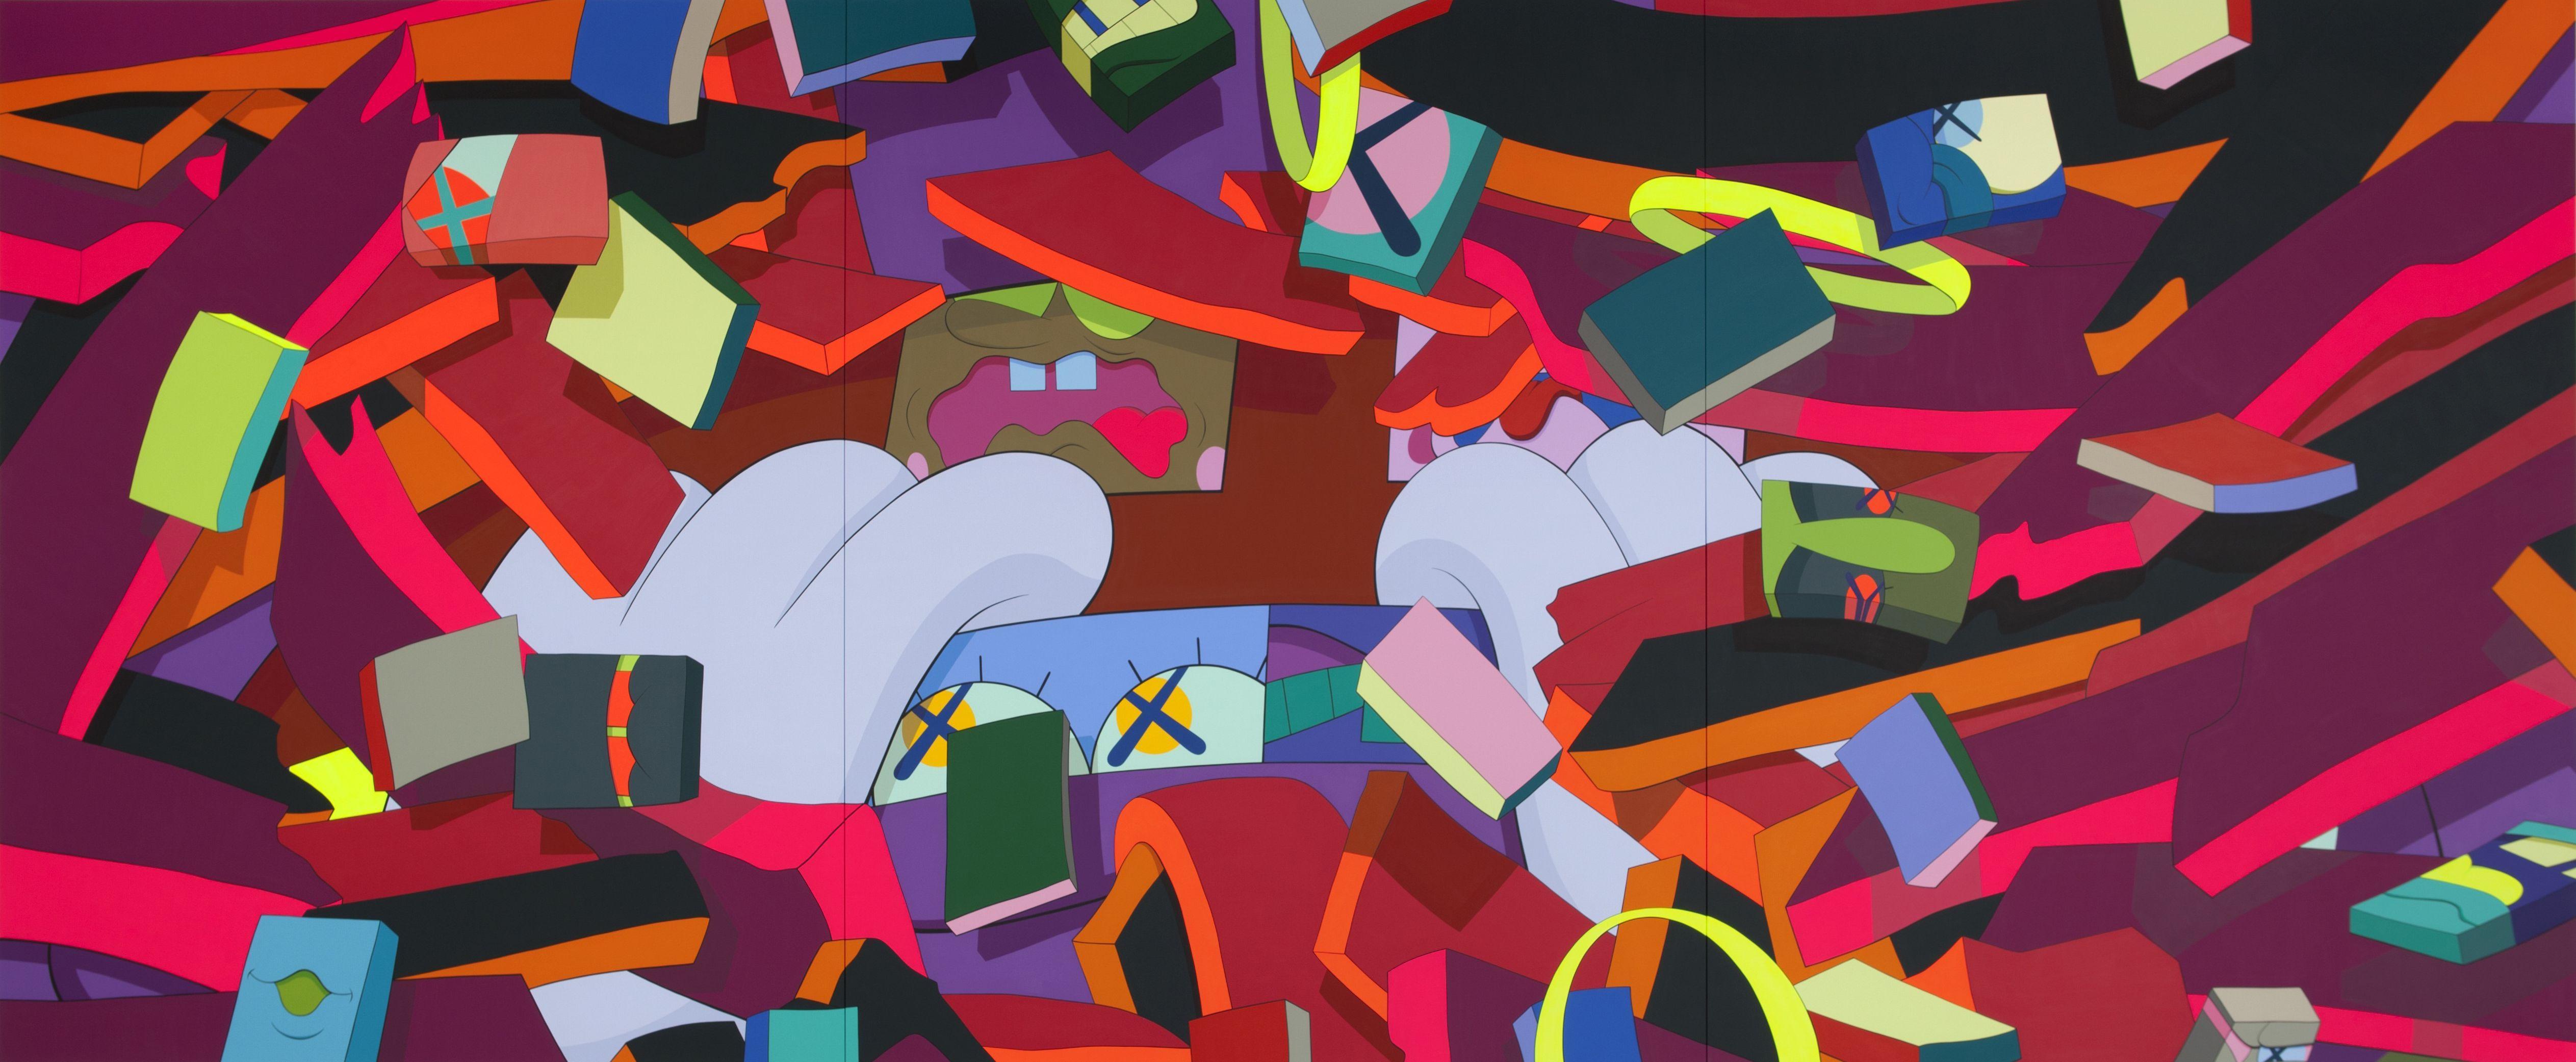 Kaws Wallpapers Wallpaper Cave